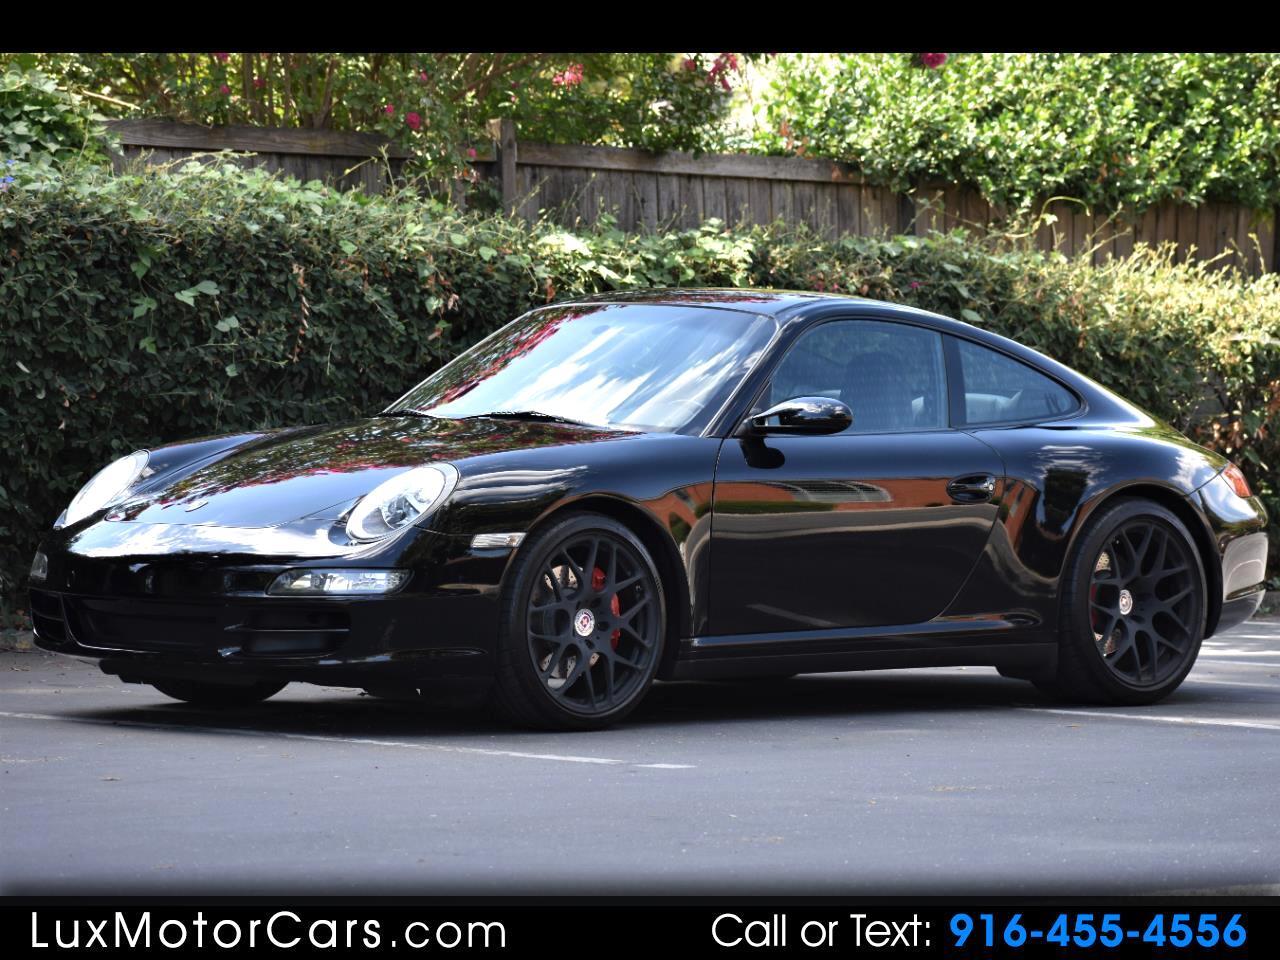 2008 Porsche 911 Carrera 4S Coupe